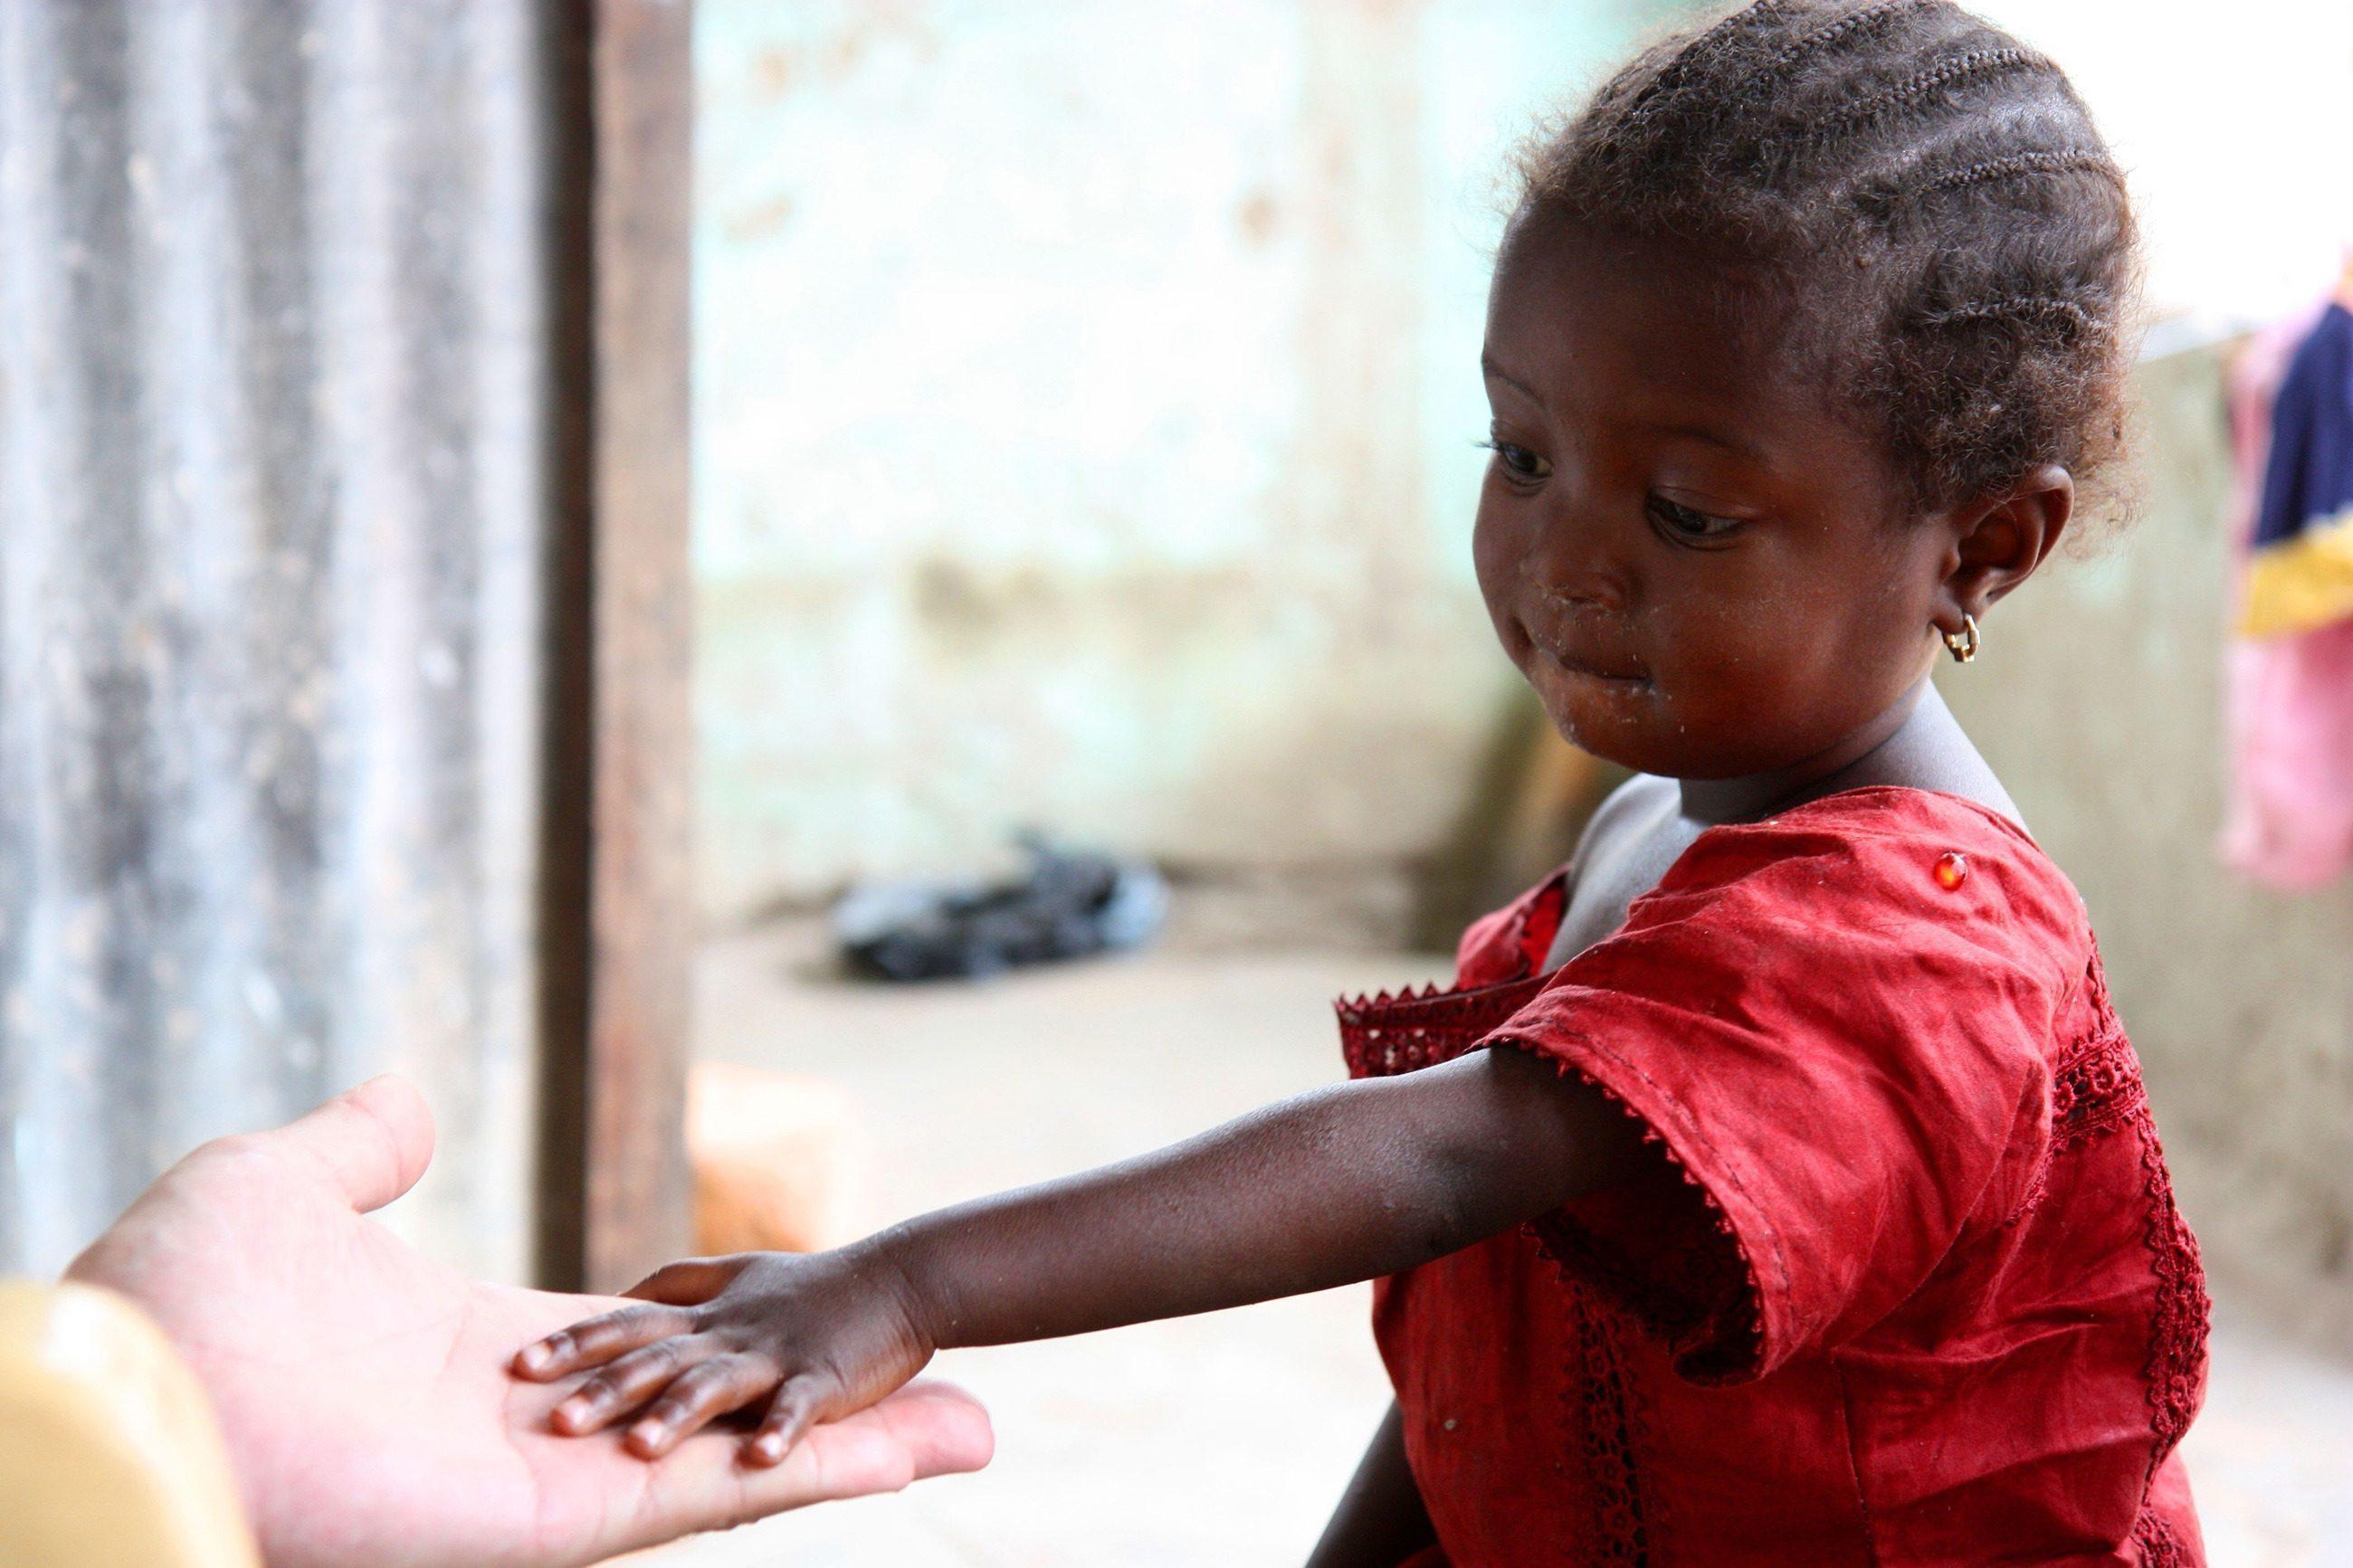 Una bambina africana tende la mano a un padrino.